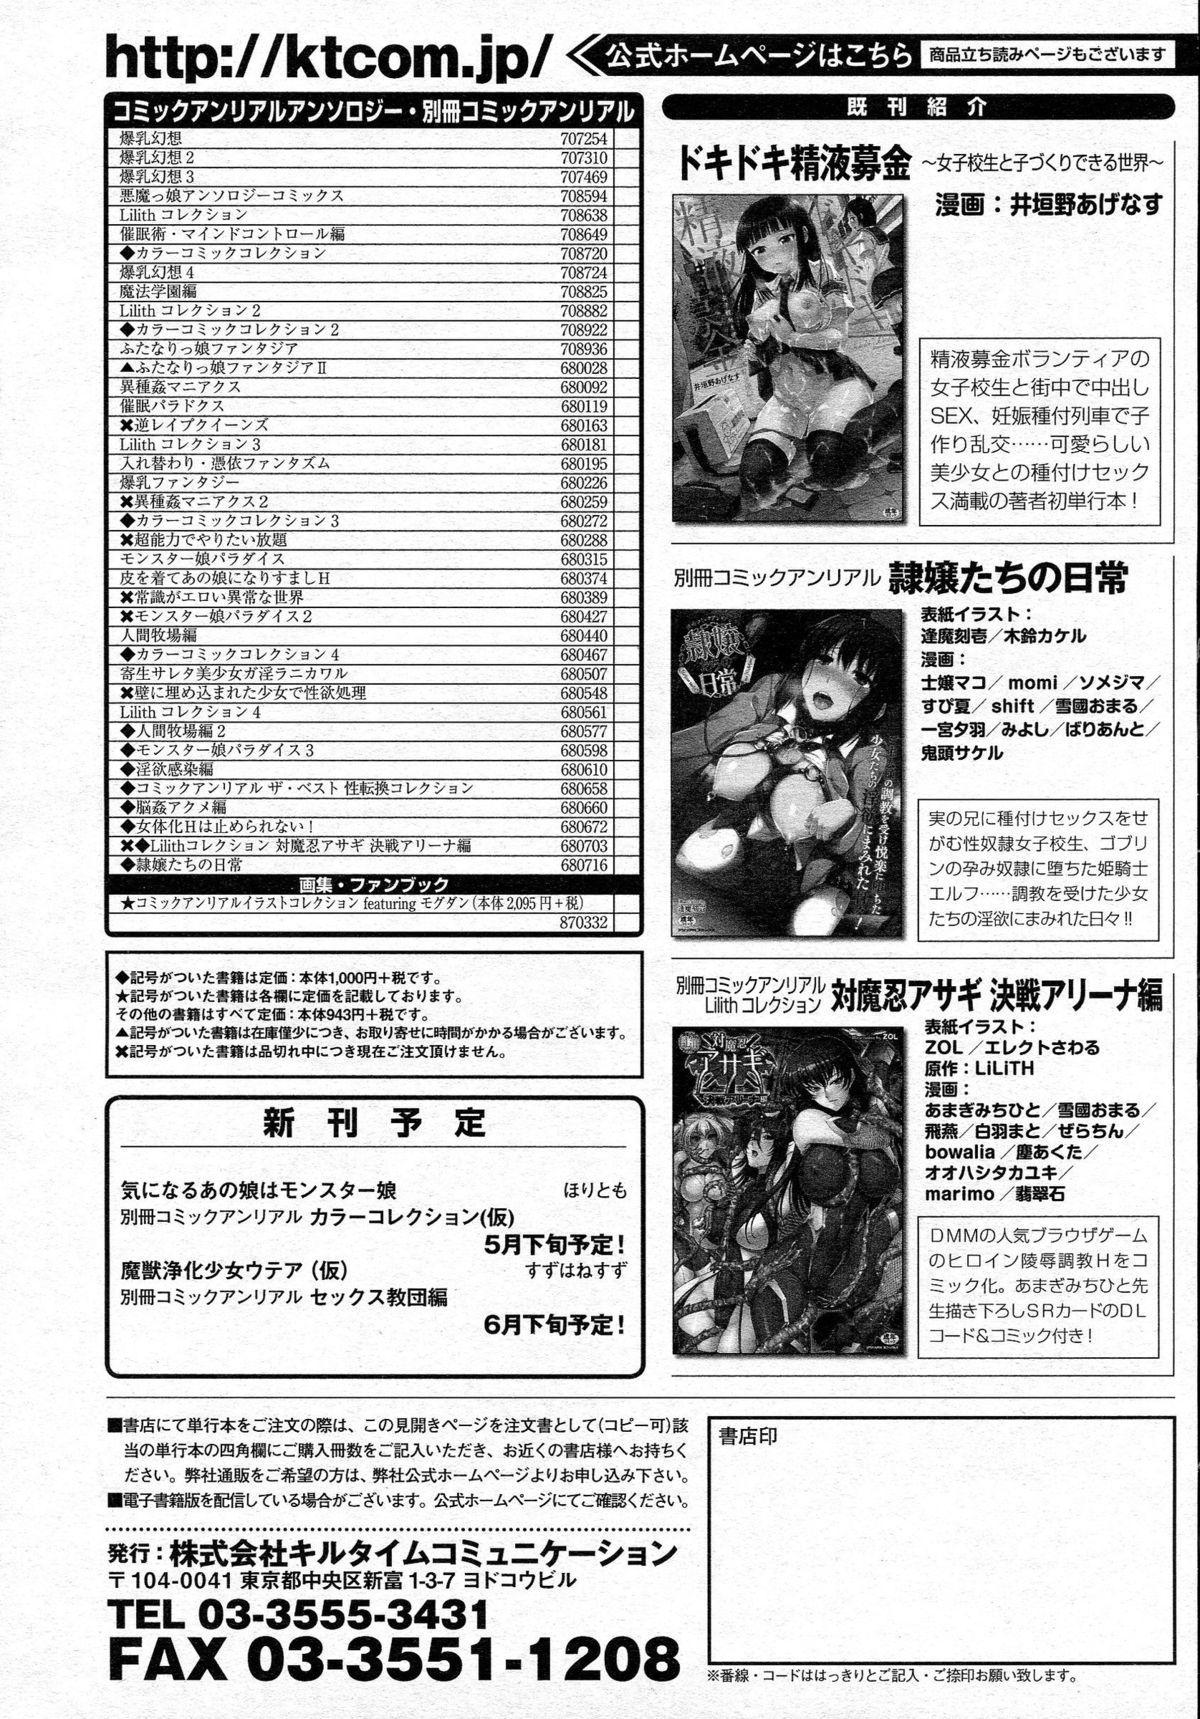 COMIC Unreal 2015-06 Vol. 55 + Hisasi Illust Shuu 443